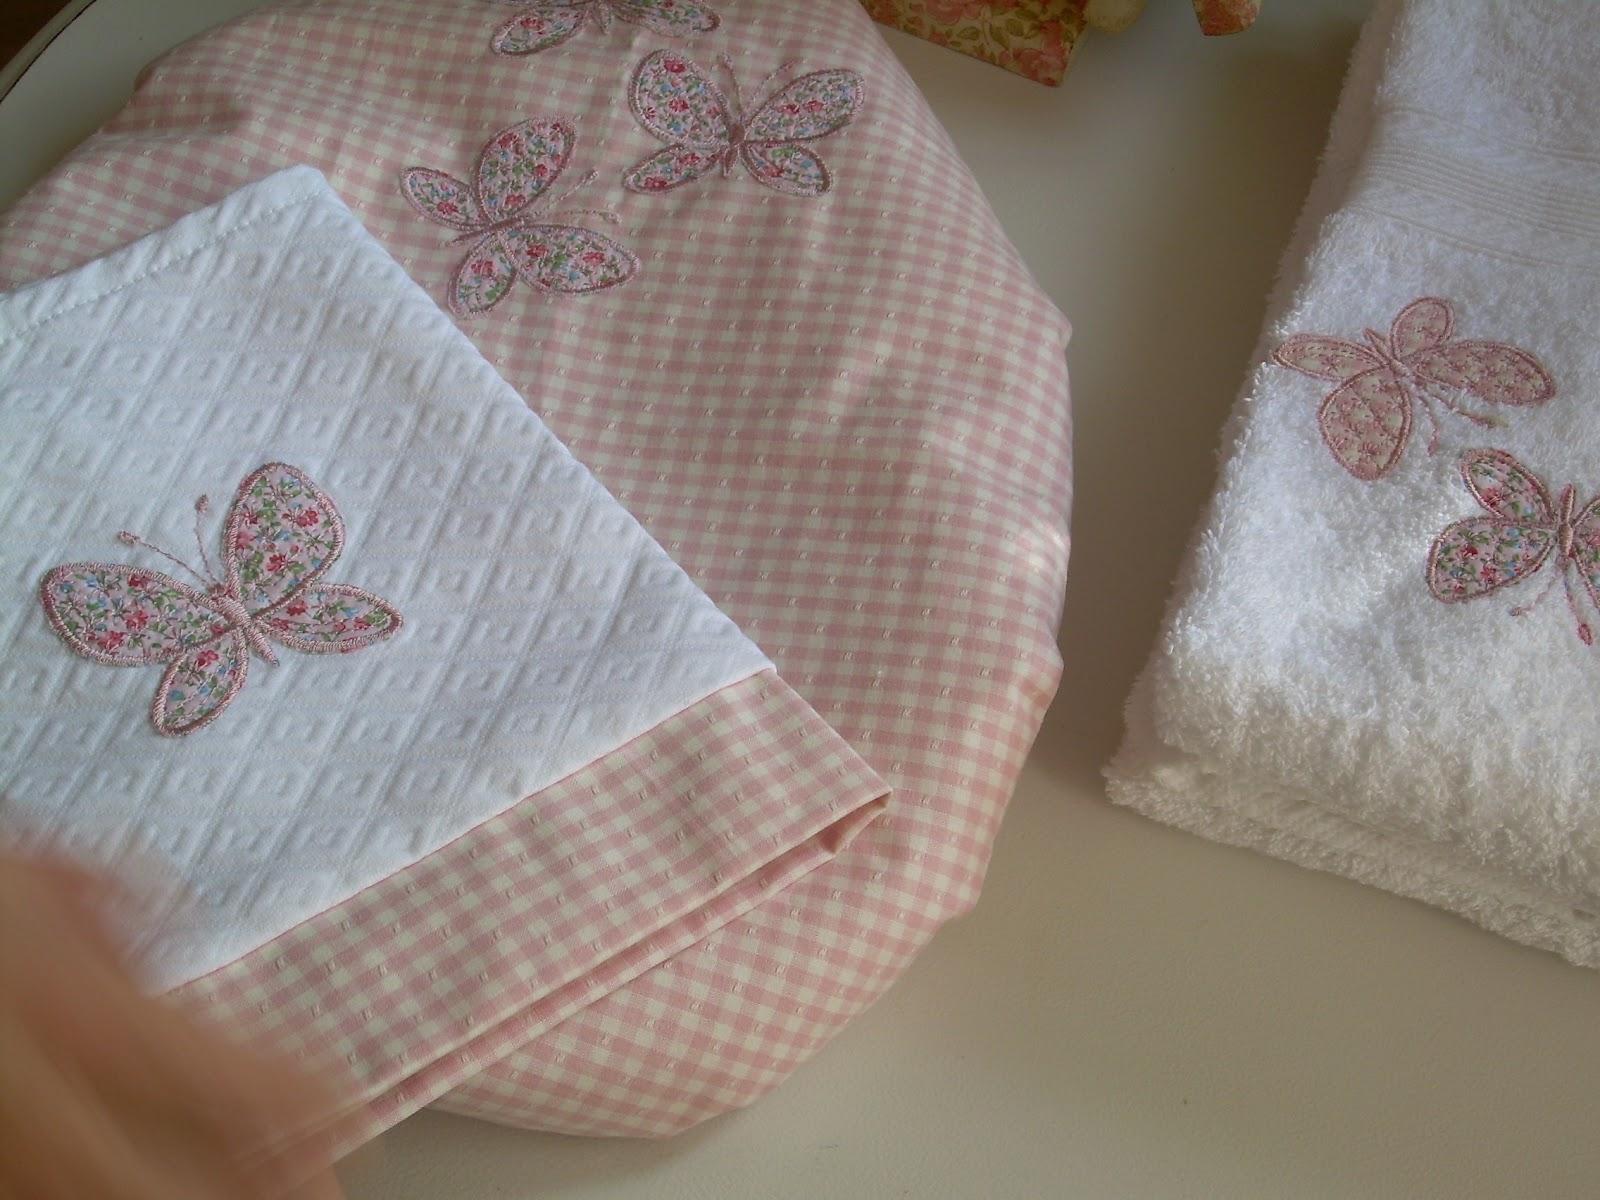 Set De Baño Infantil:set de baño detalle de bordado de cortina de baño